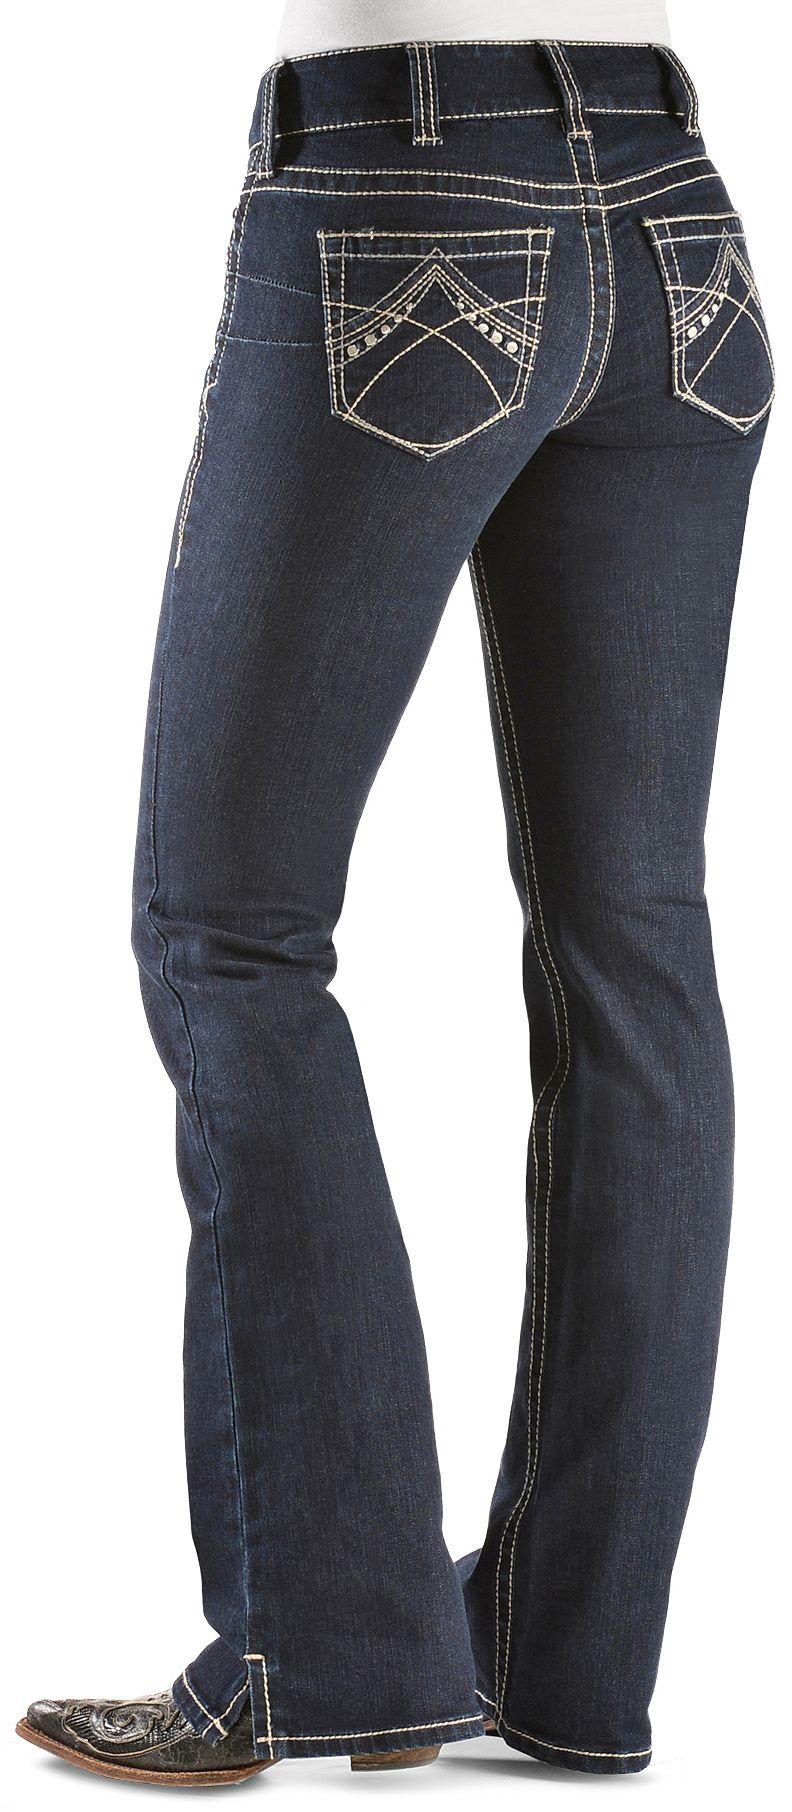 Ariat Women S Real Denim Eclipse Bootcut Riding Jeans